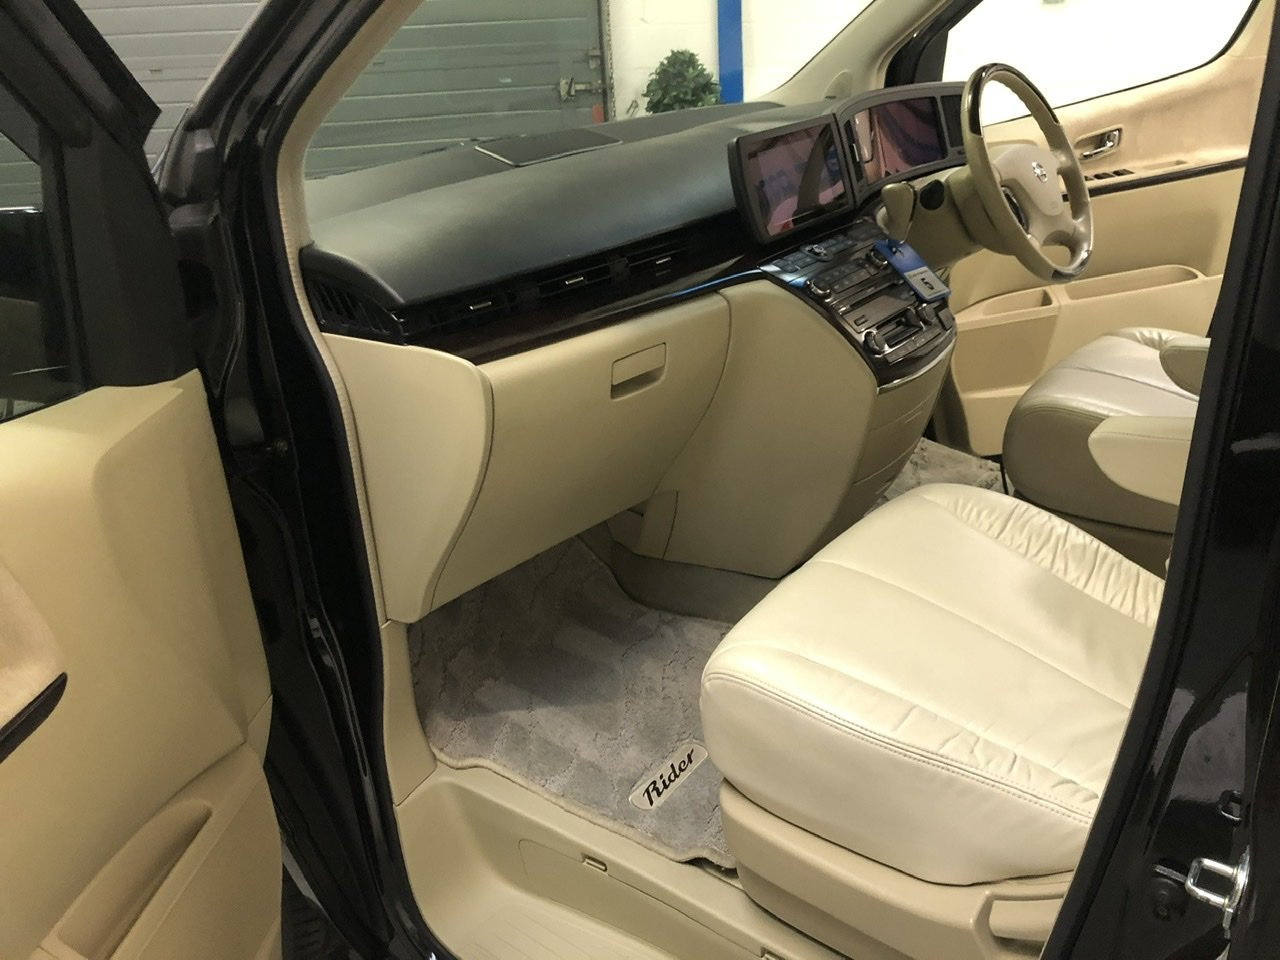 2005 NISSAN ELGRAND E51 3.5i V6 RIDER Autech, G30 Black, Series 2 For Sale (picture 6 of 6)